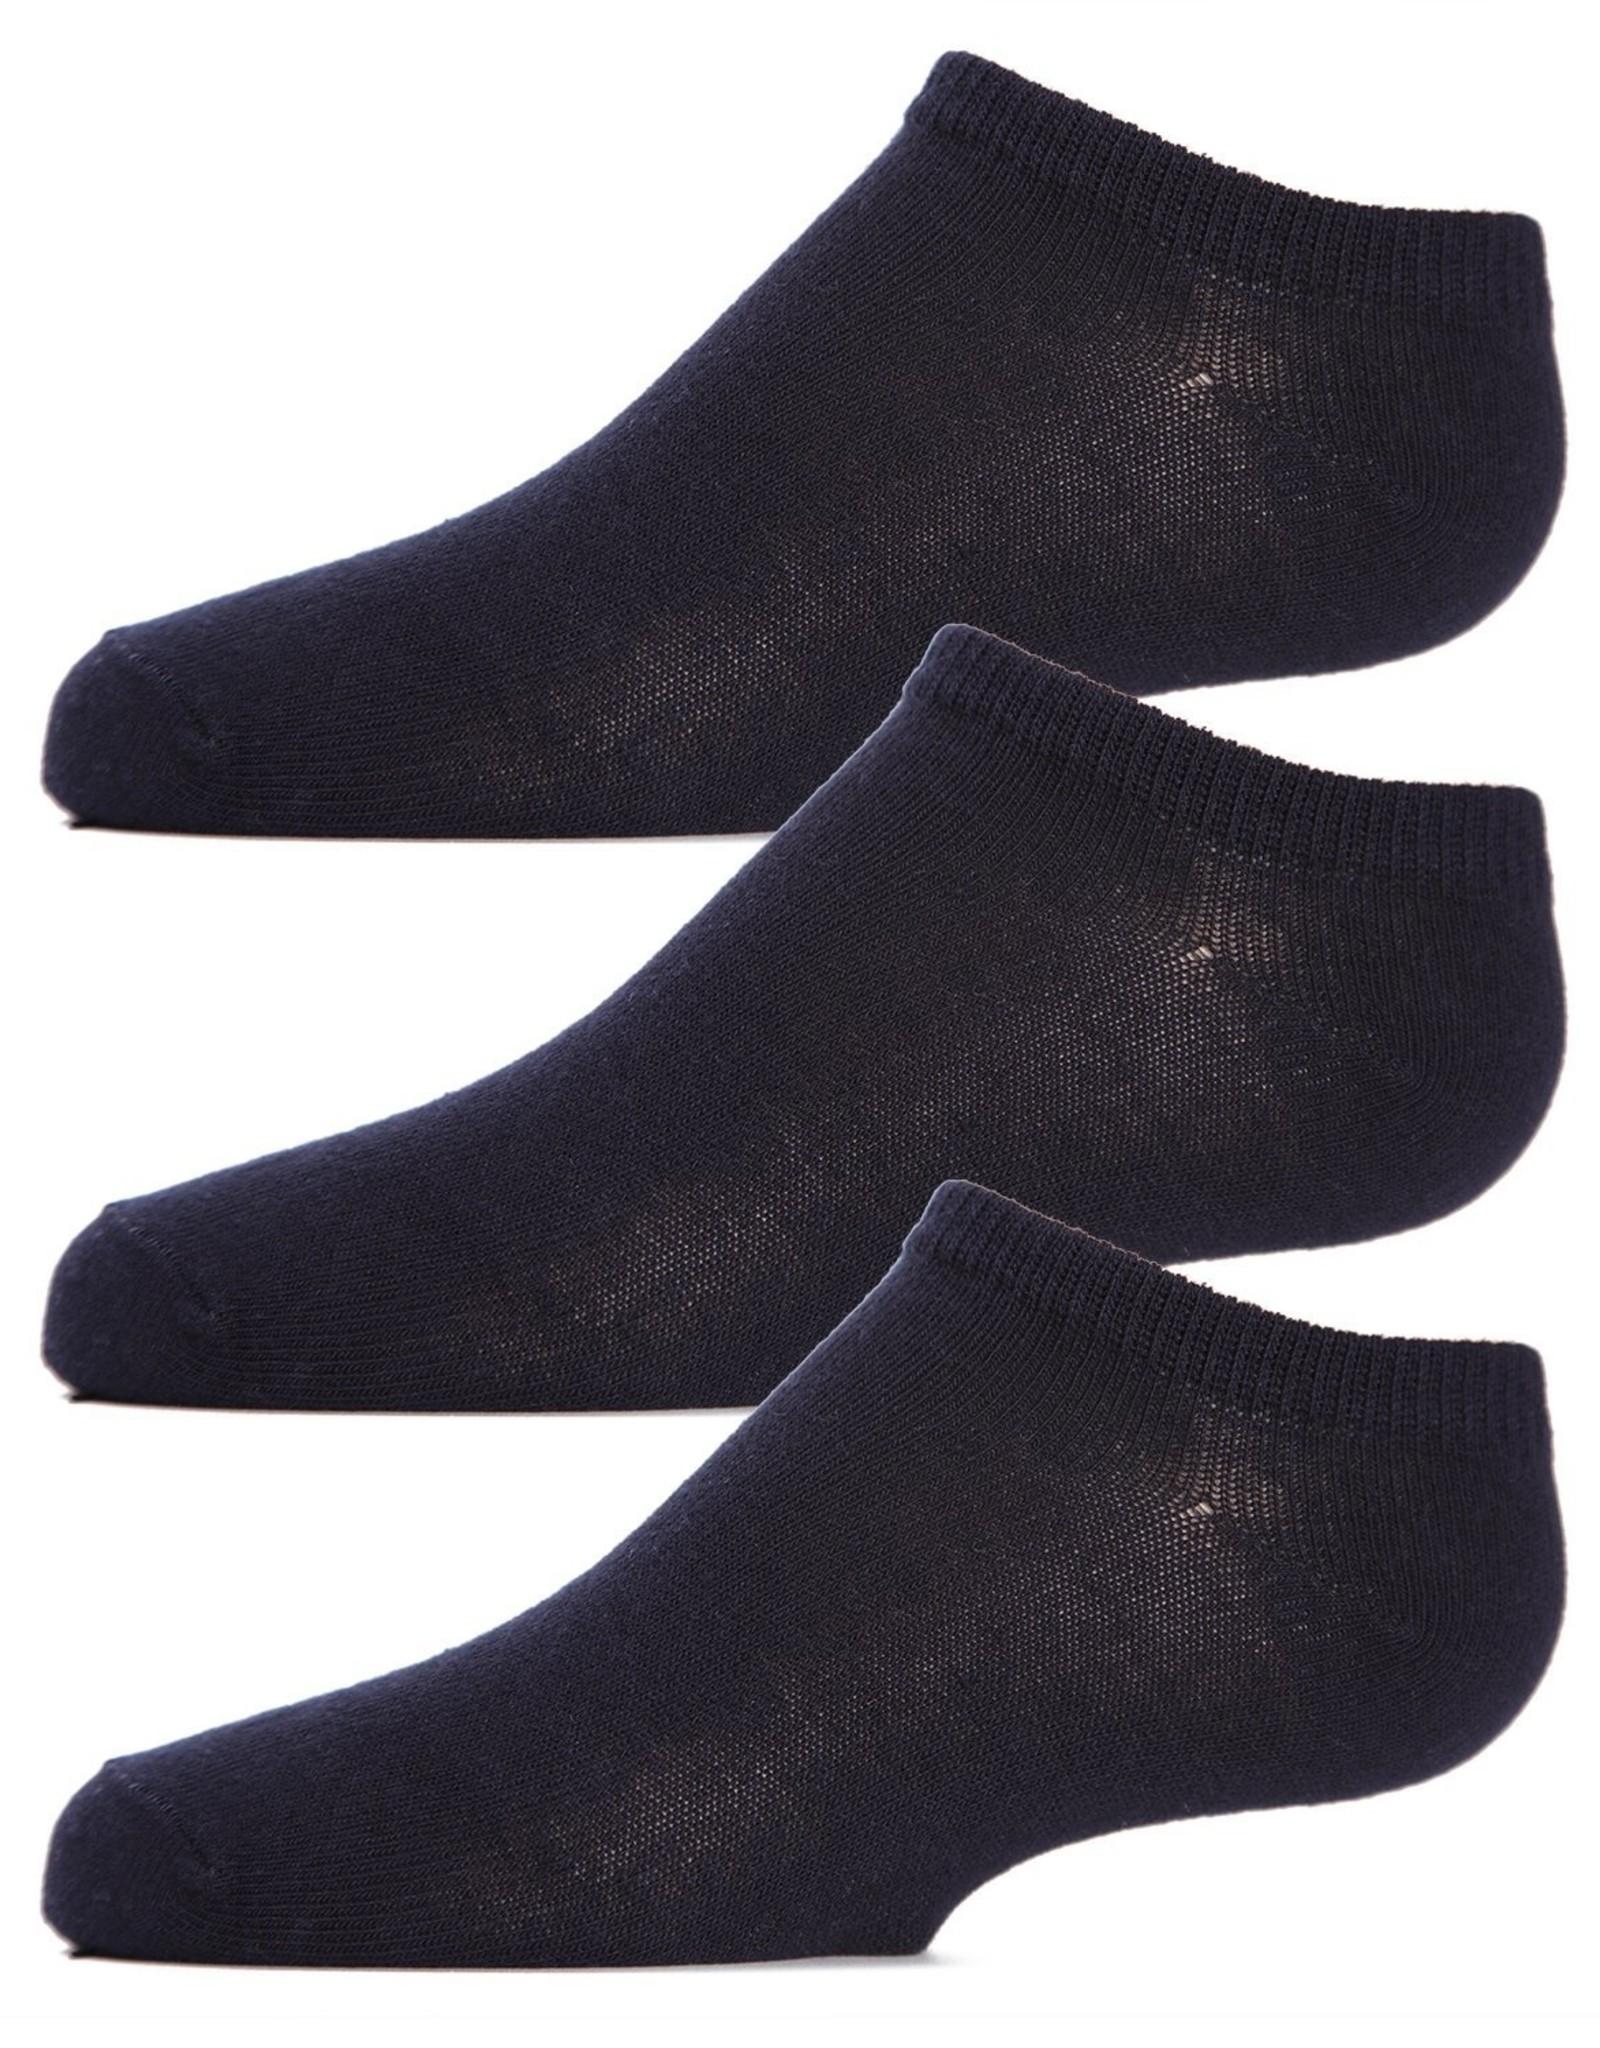 Memoi Memoi Low Cut Socks 3-Pack